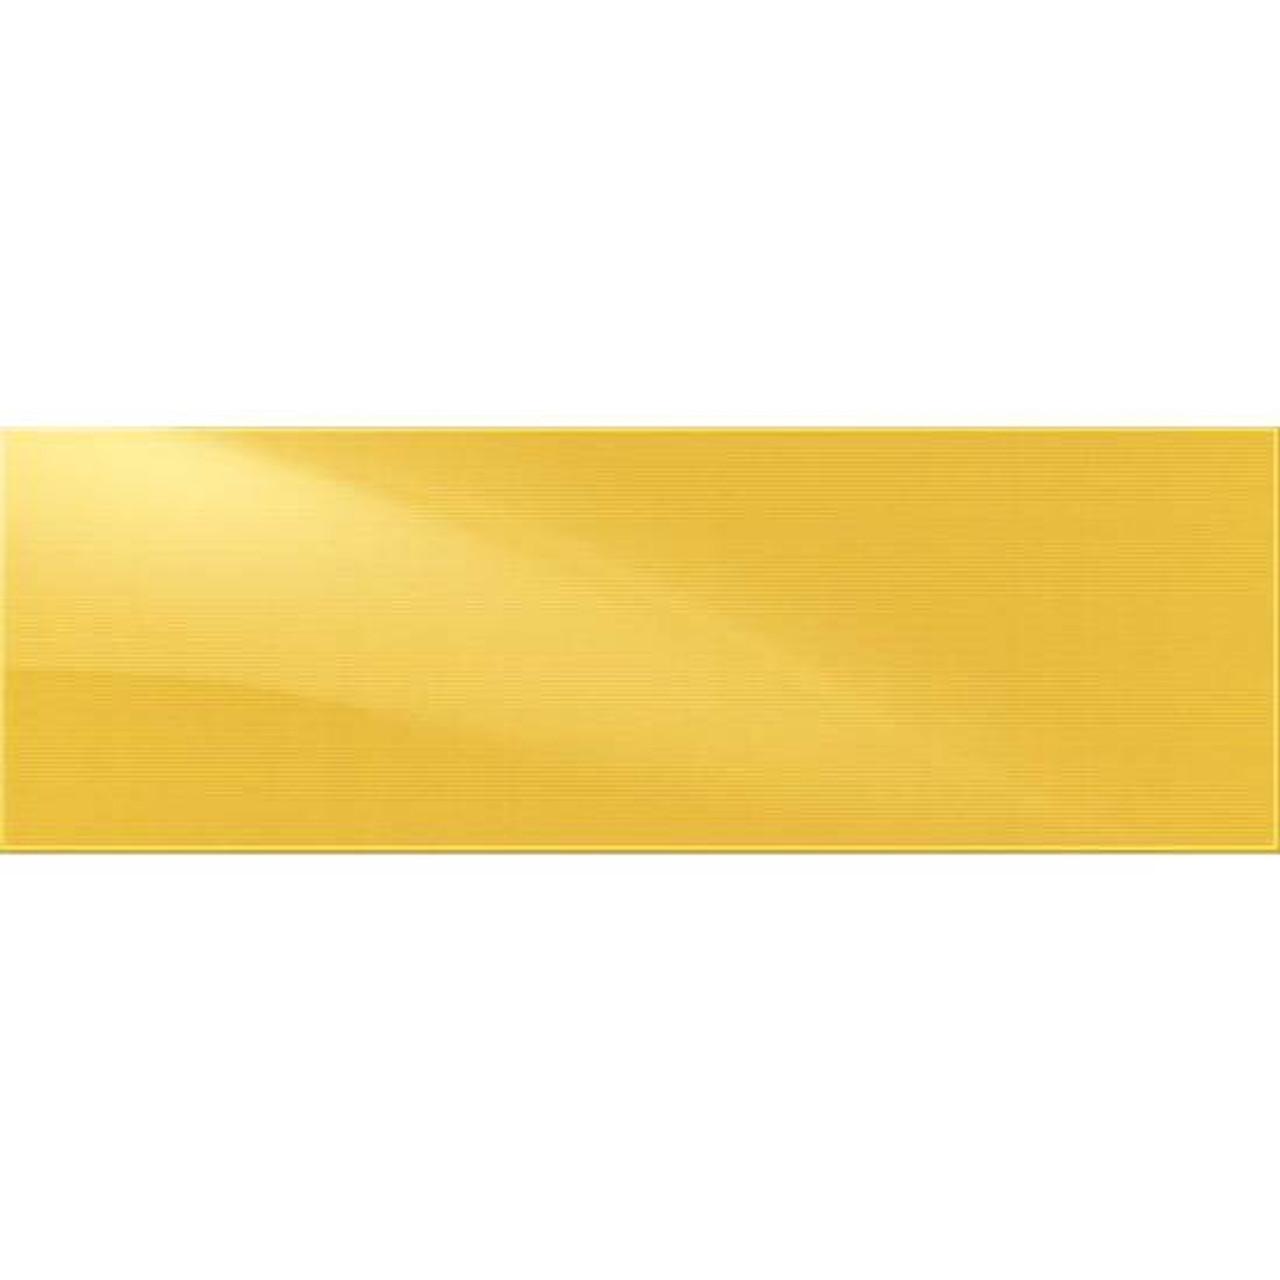 perspecta starburst yellow ceramic wall tile 8x24